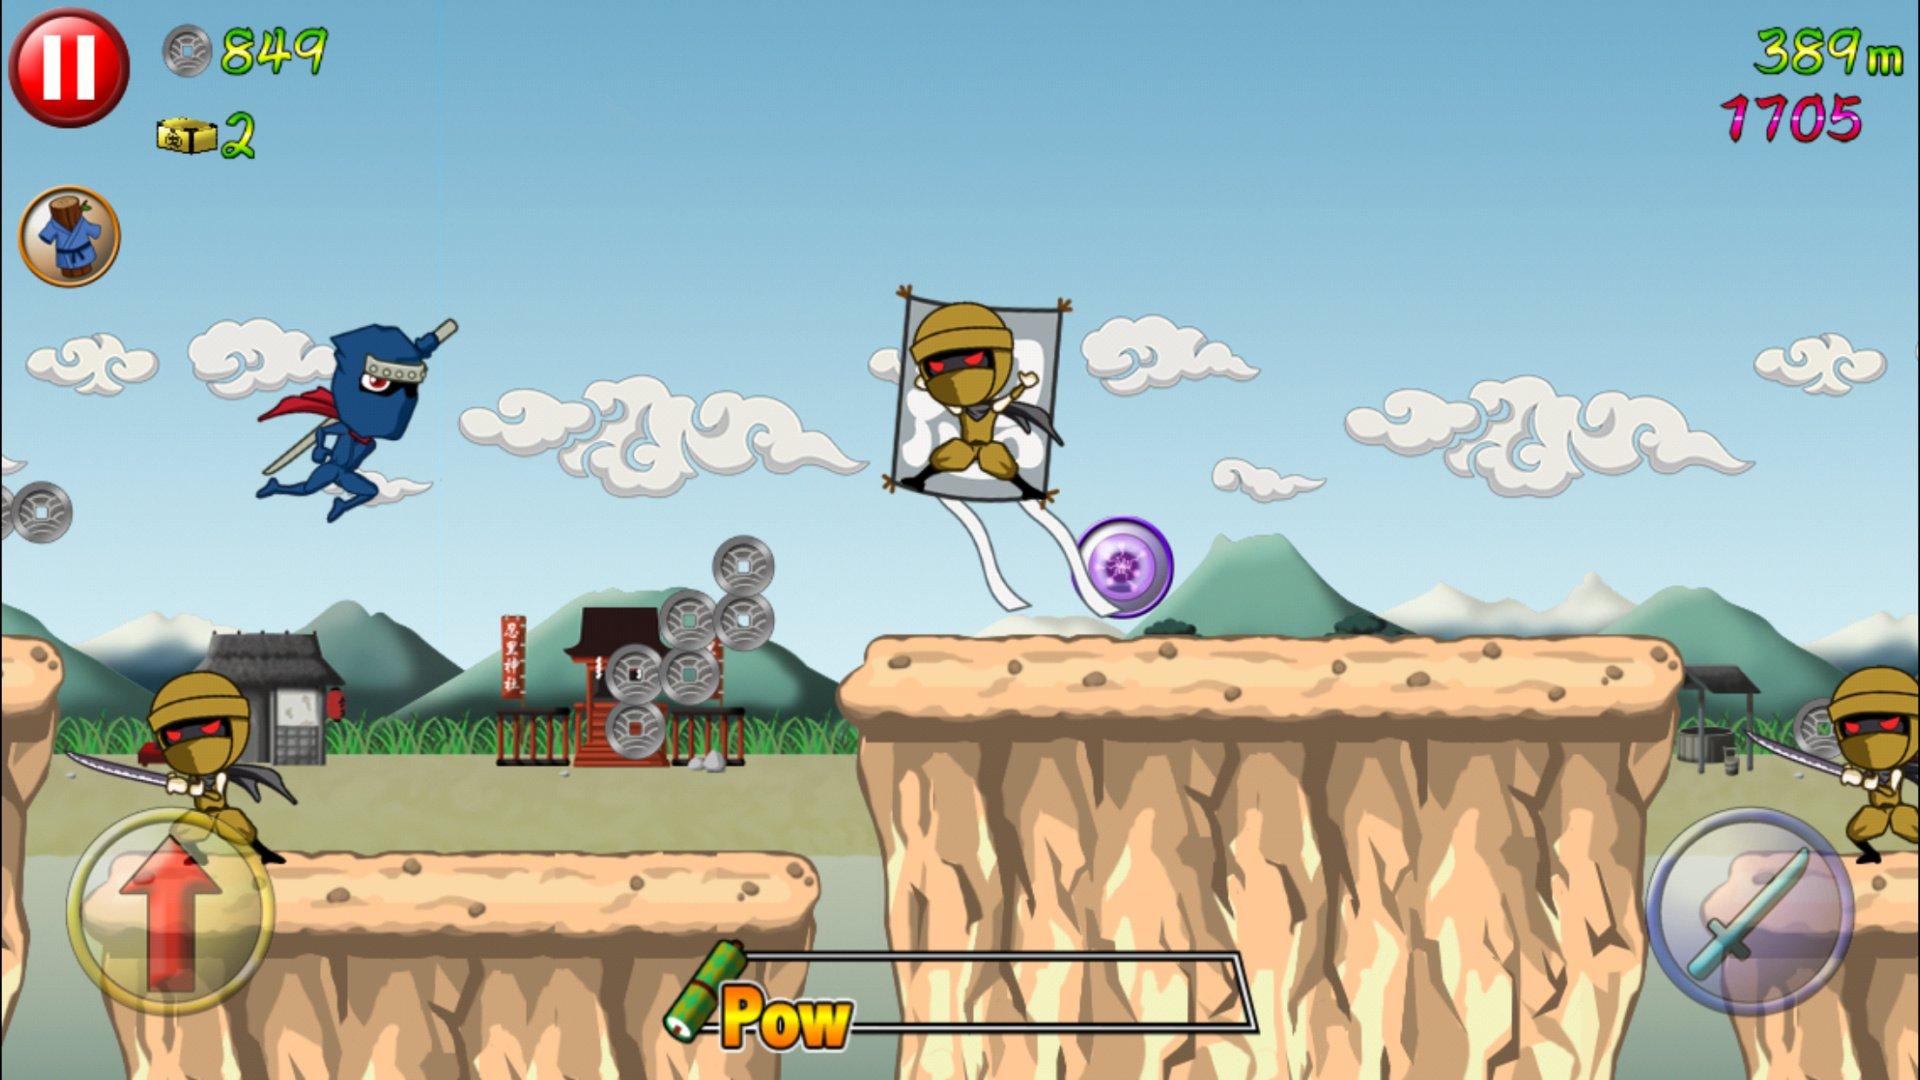 Fatal Frame: Maiden of Black Water (Wii U eShop) Screenshots